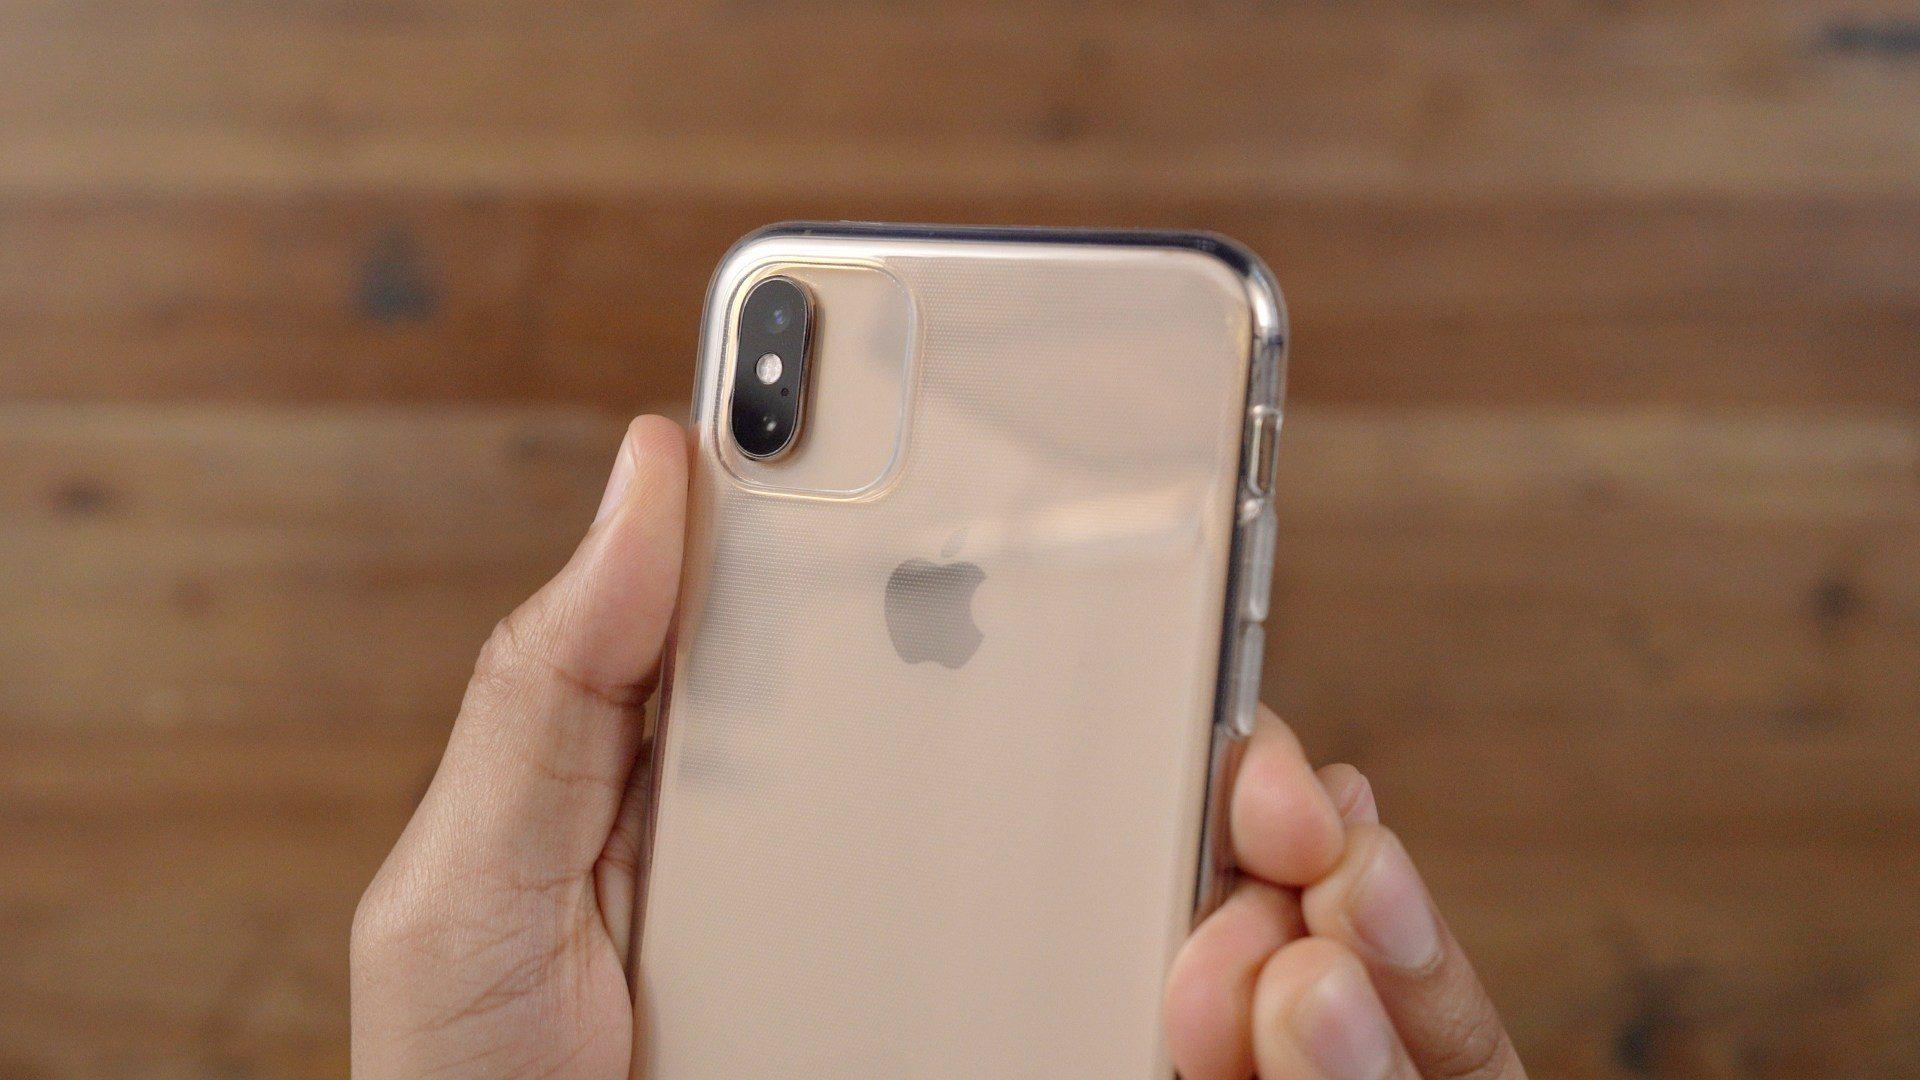 نگاهی به قاب آیفون ۱۱ (iPhone 11) و مقایسه با آیفون XS